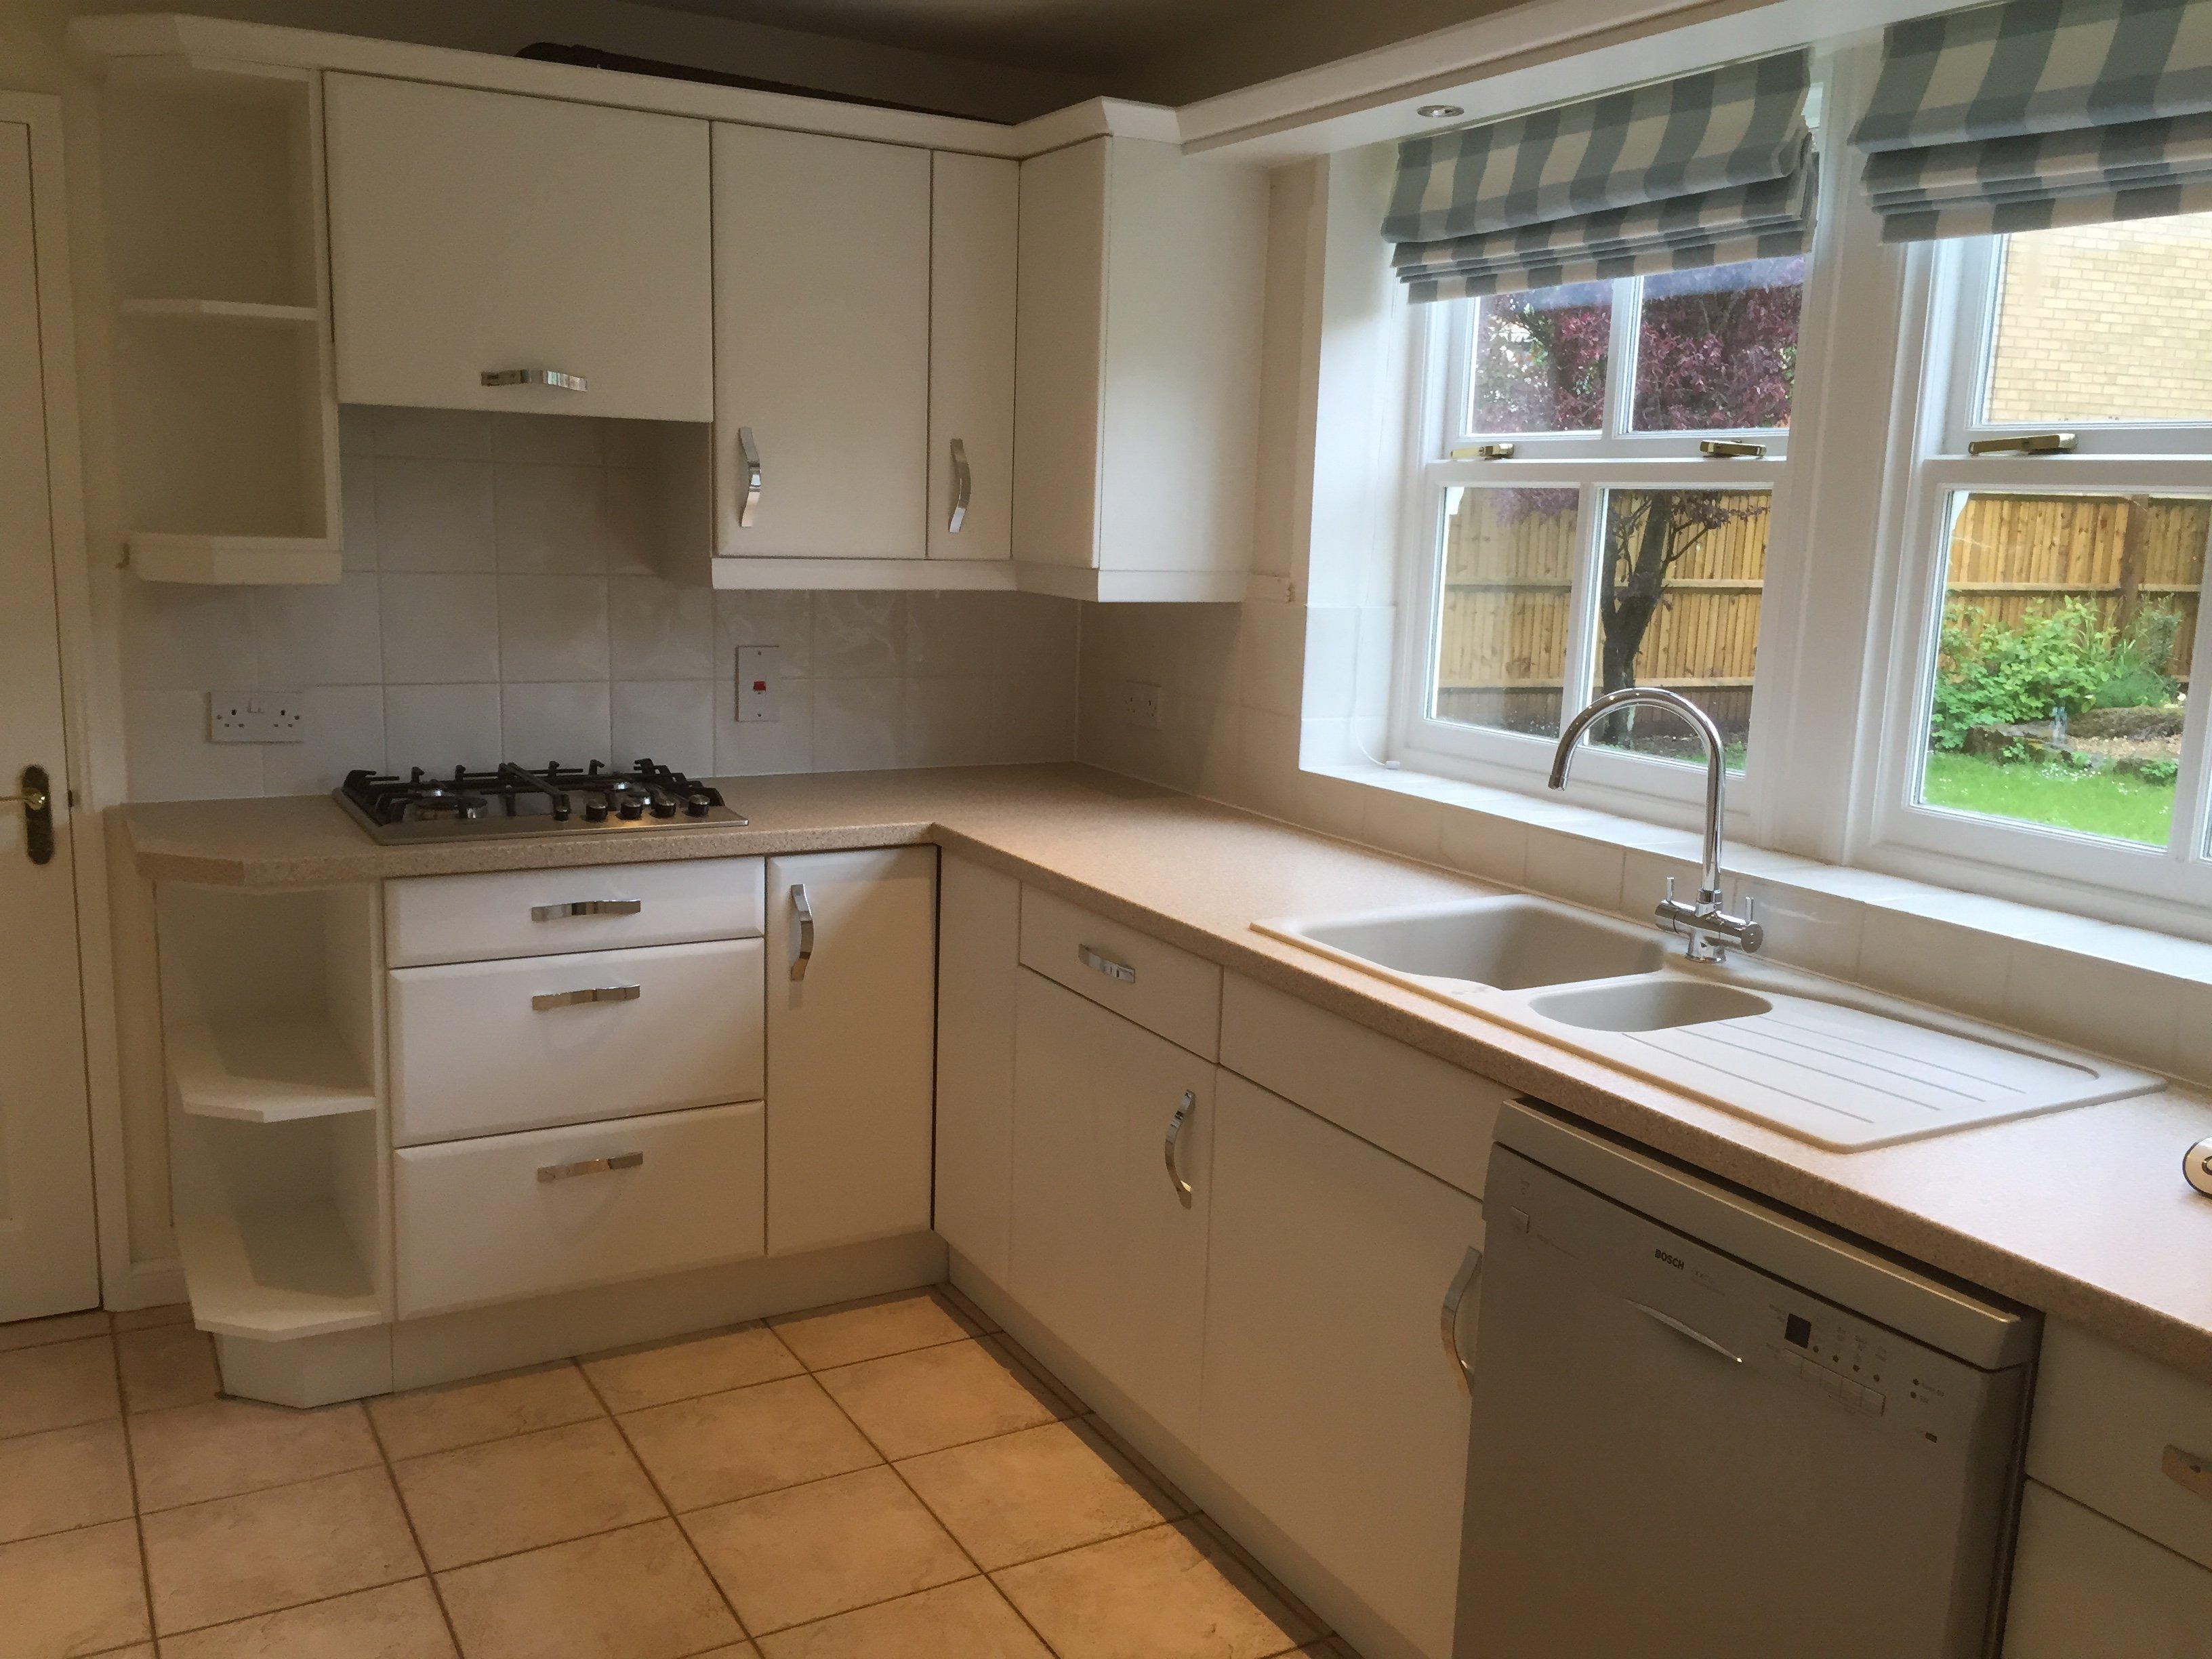 Made to measure kitchen in Bognor Regis